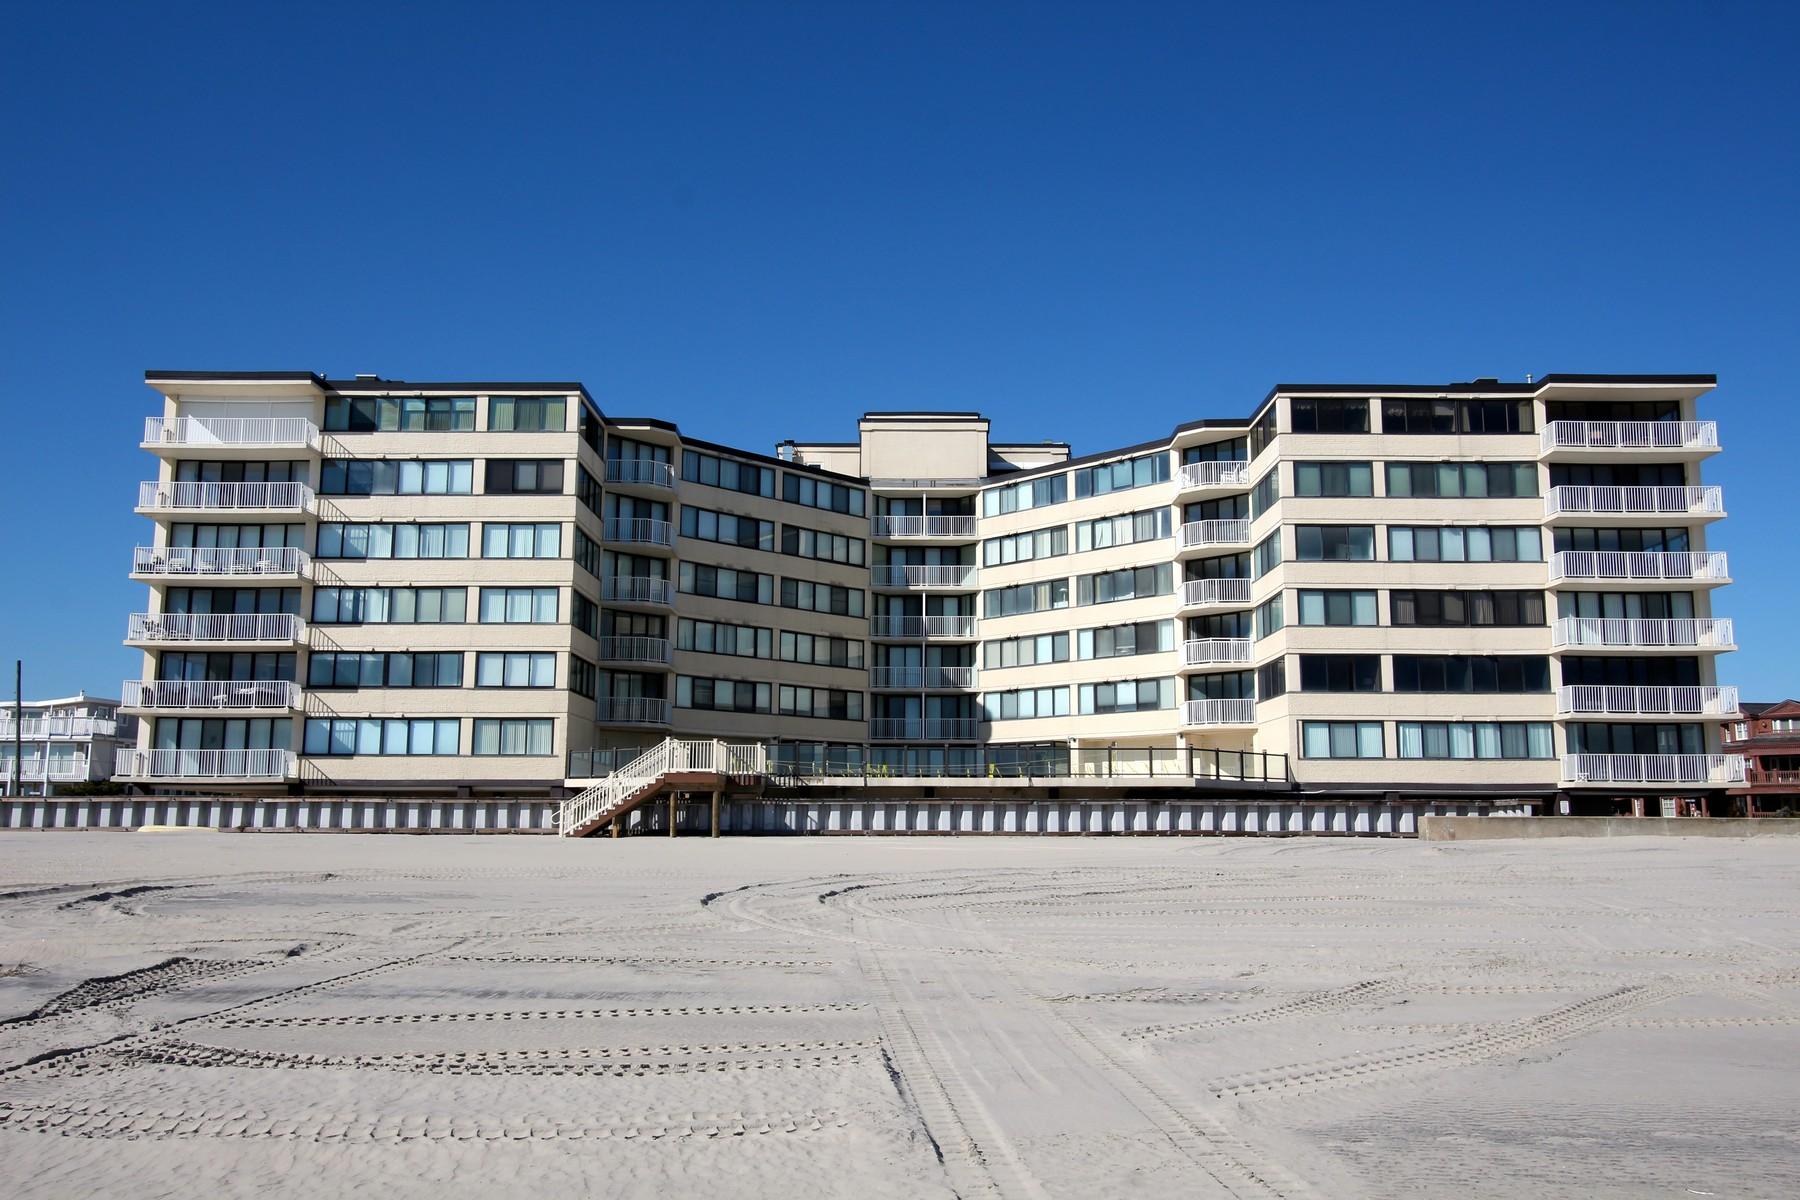 Condominium for Sale at Longport Seaview 111 S 16th Avenue #303 Longport, New Jersey 08403 United States